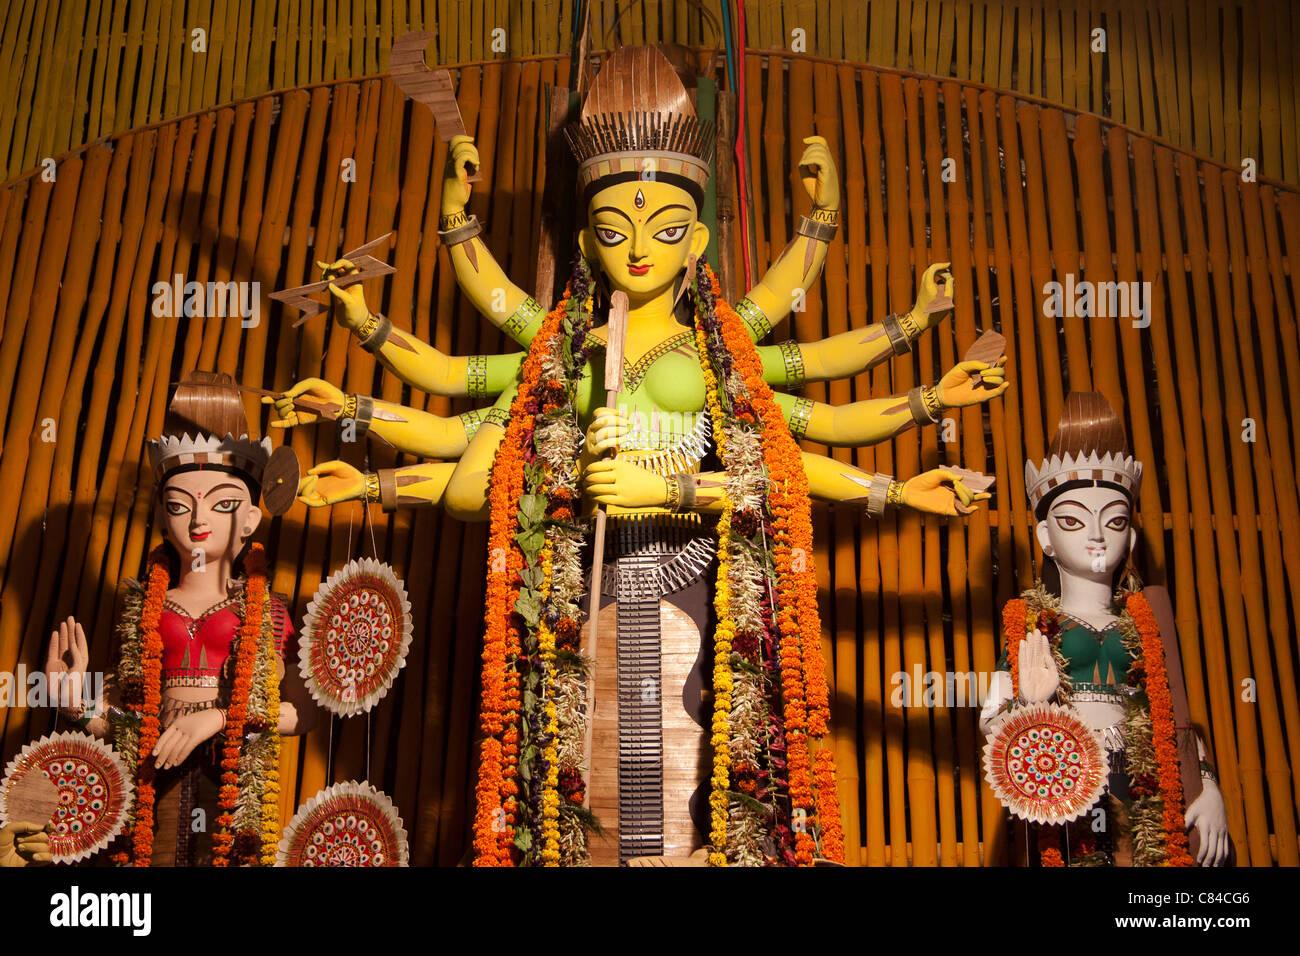 Depiction of Goddess Durga at 'Santoshpur Trikon Park Durgotsab Pujo Committee' in Kolkata (Calcutta), West - Stock Image